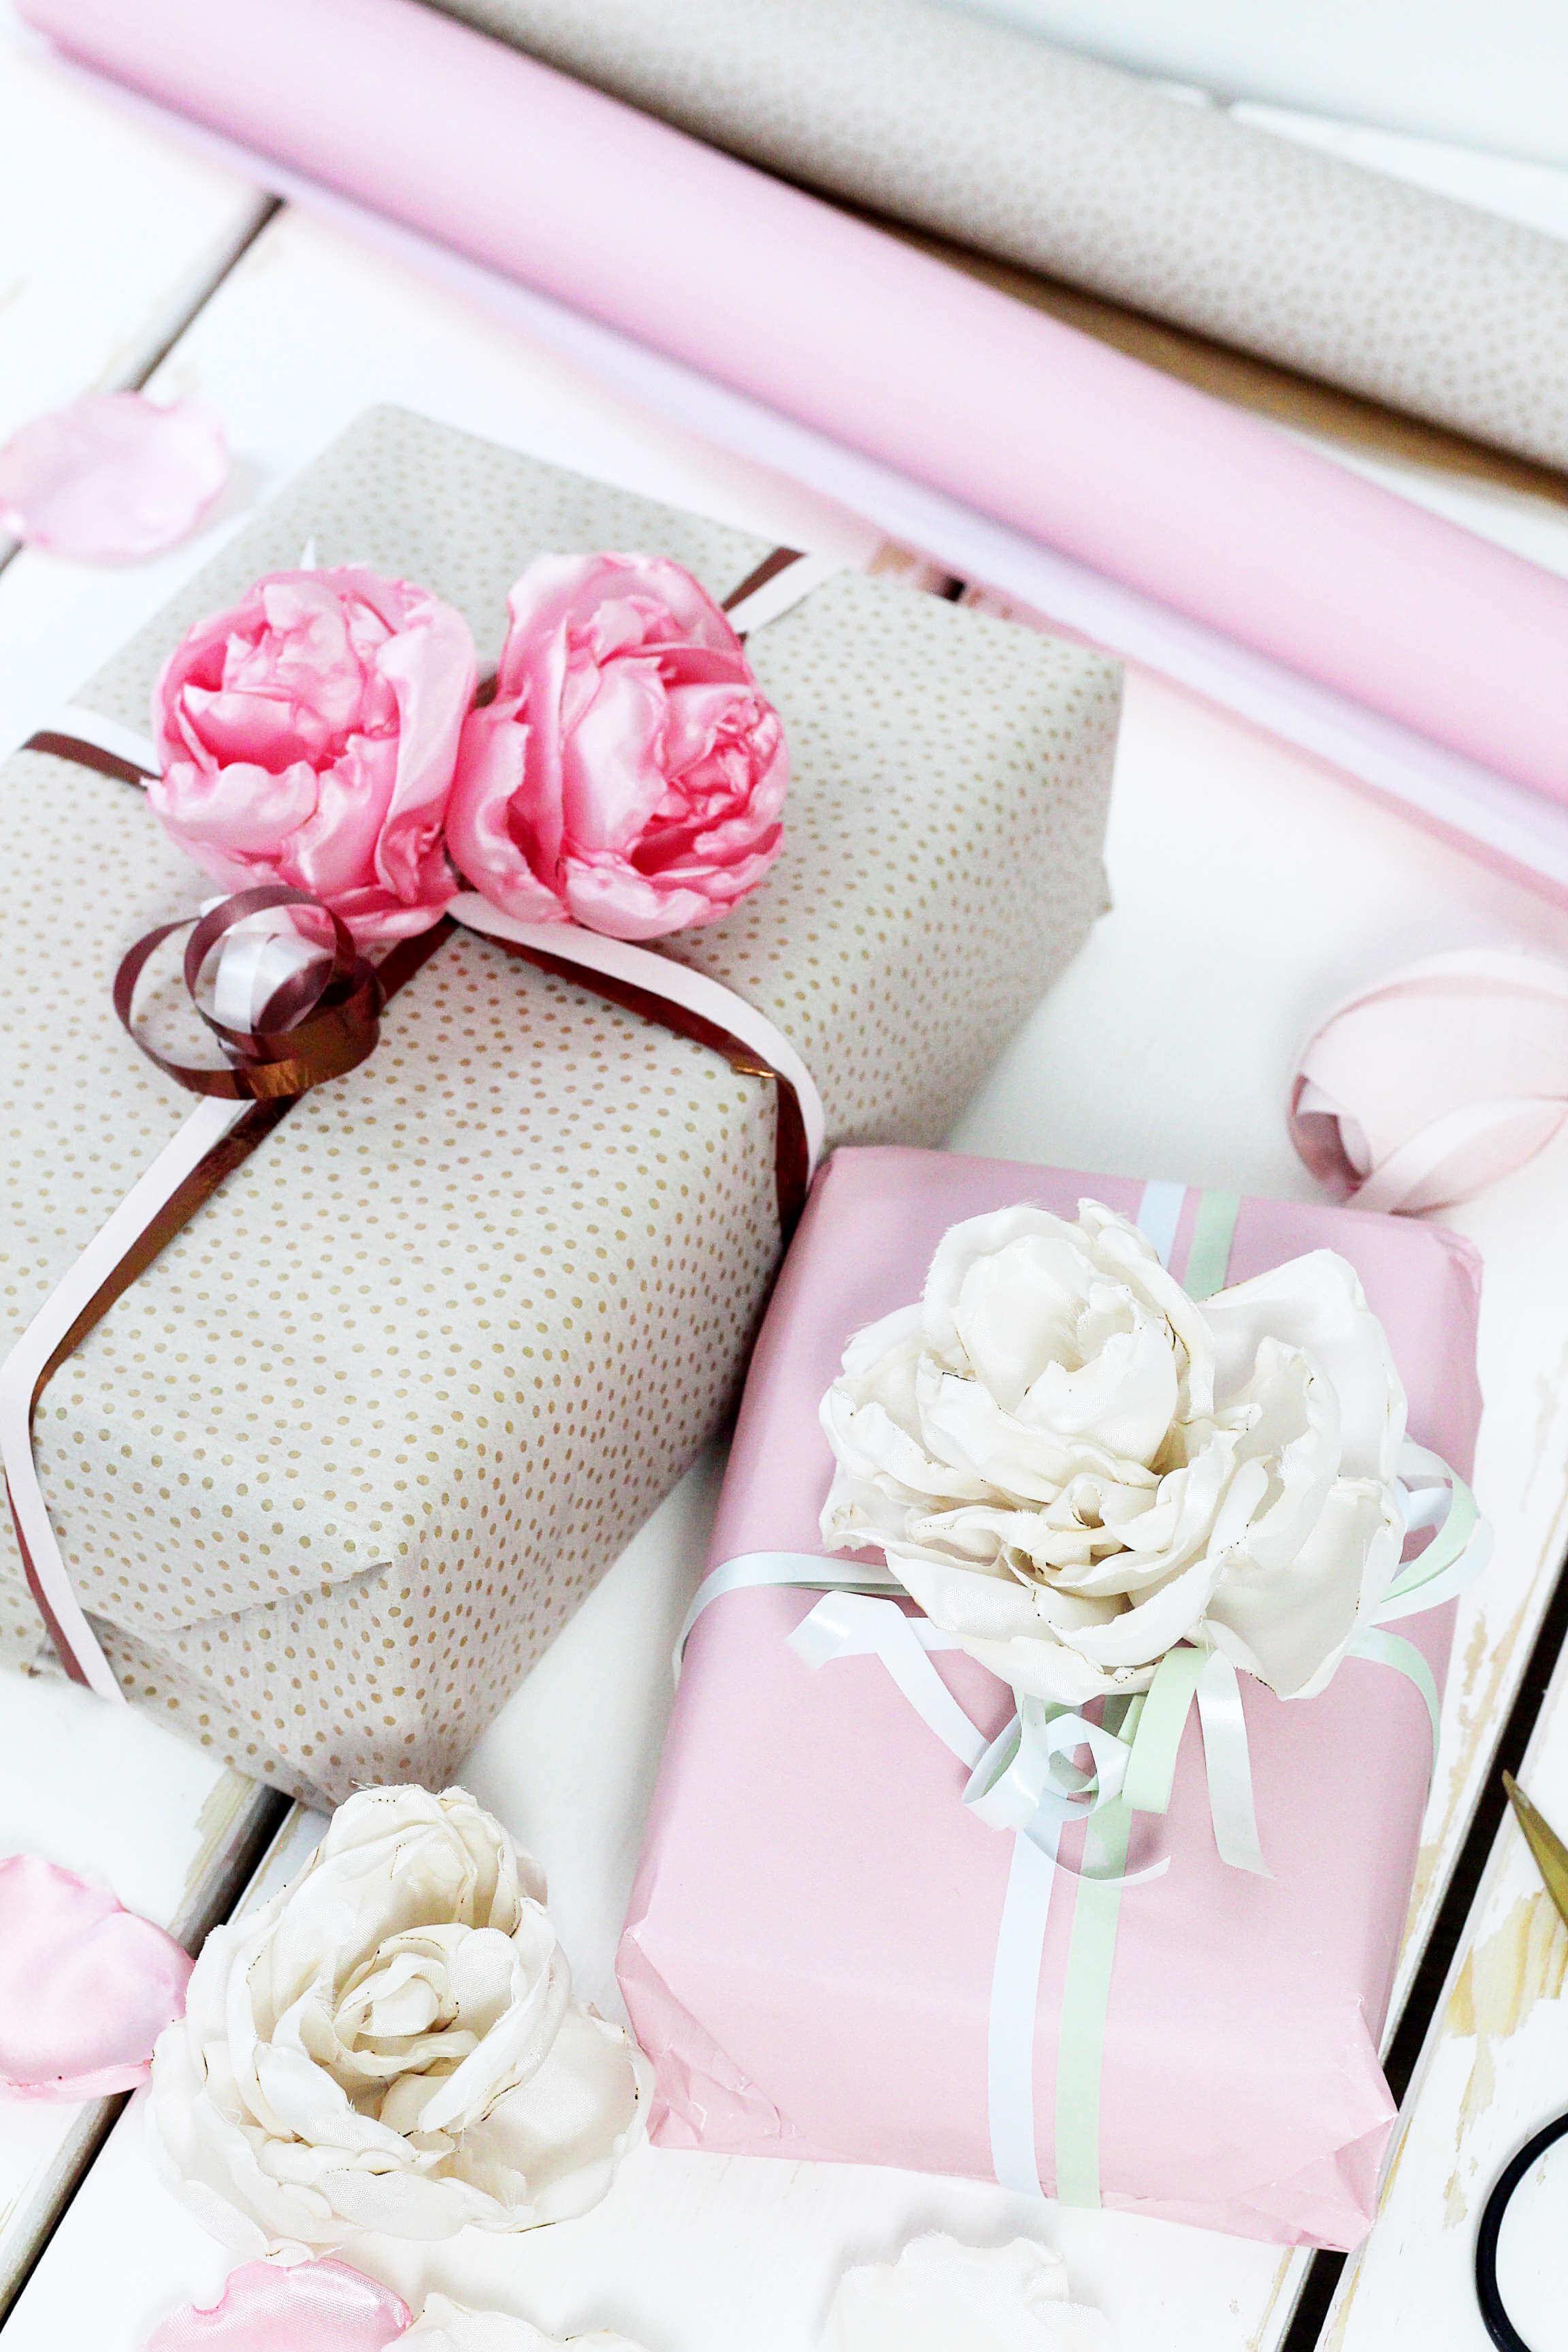 diy-geschenke-geschenkverpackung-selbermachen-organza-blumen-diy-blog